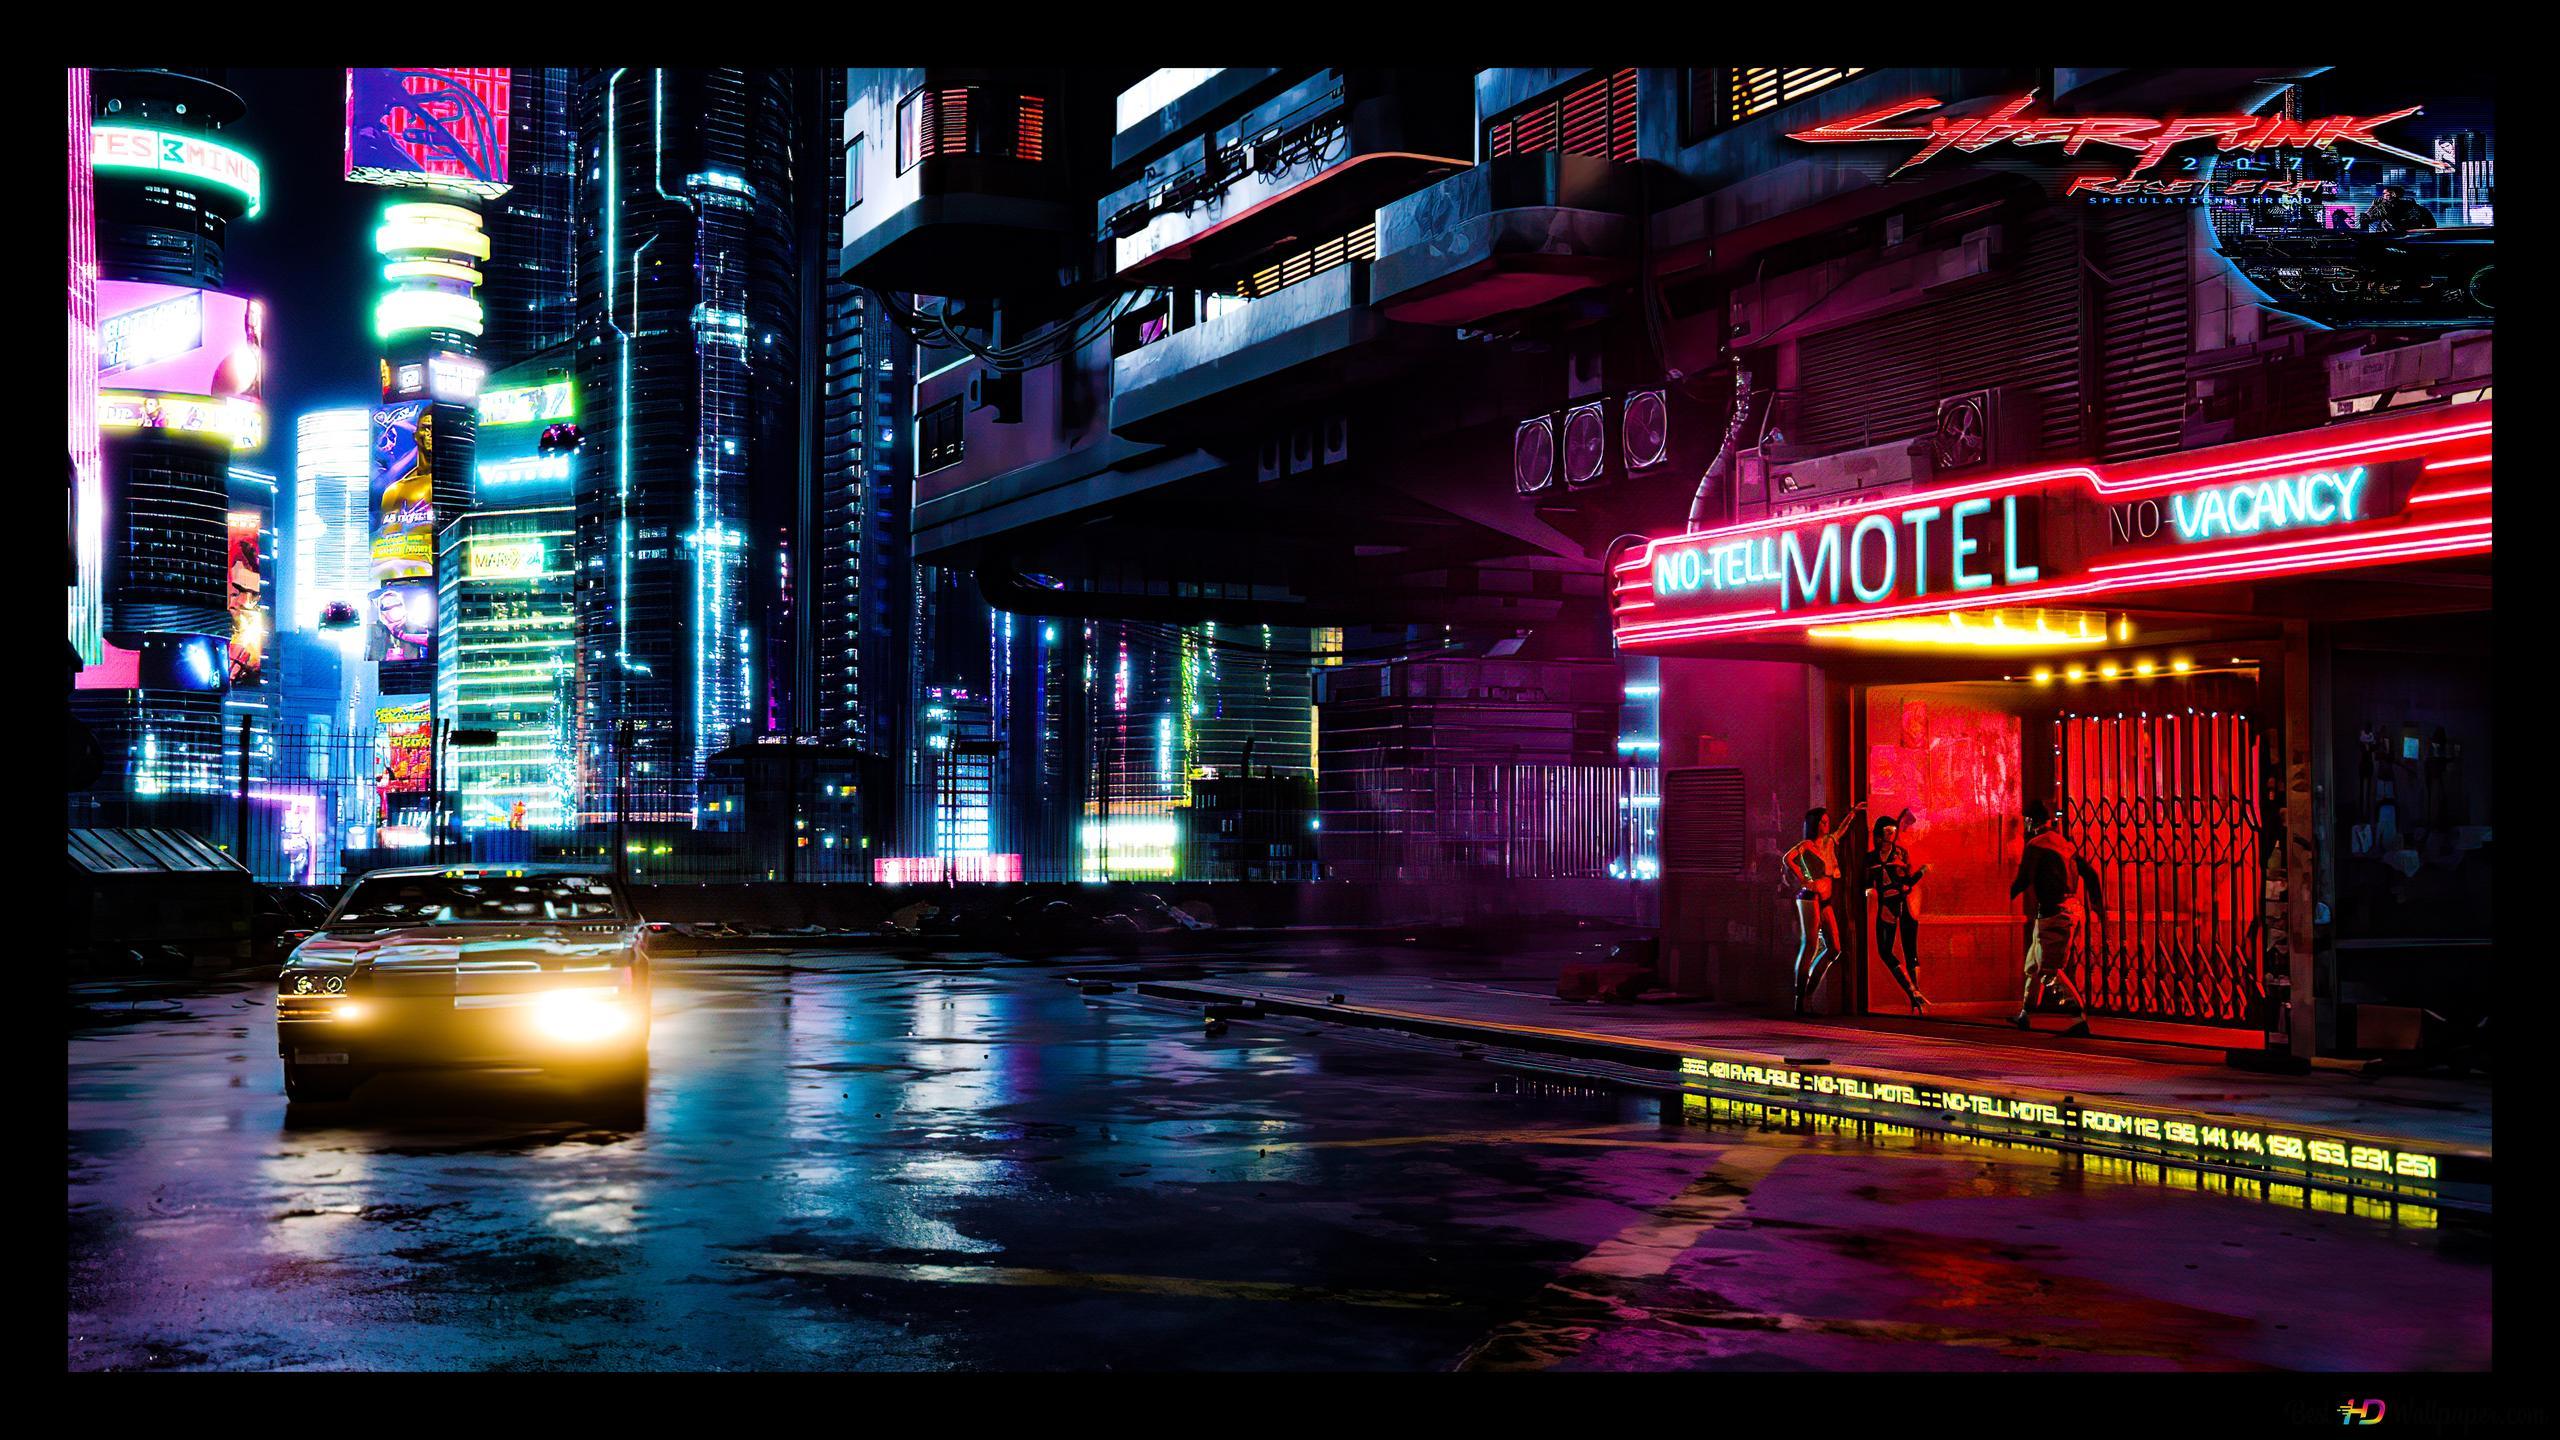 Cyberpunk 2077 - CITY 8K 4K HD wallpaper download